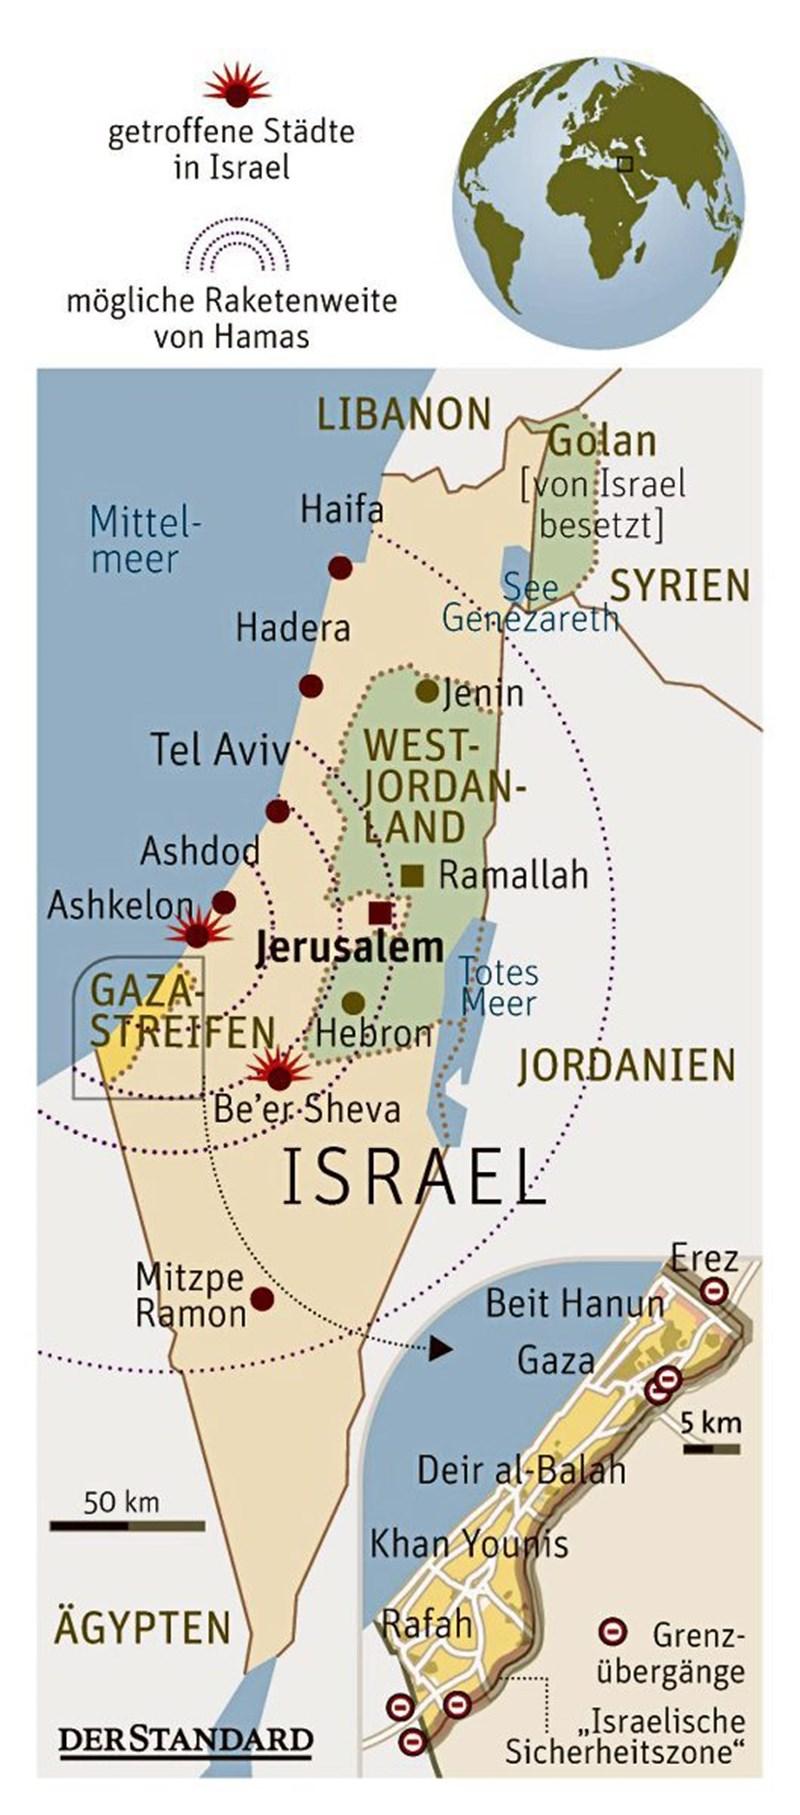 Palästinenser verkünden Waffenstillstand mit Israel - Nahost ...